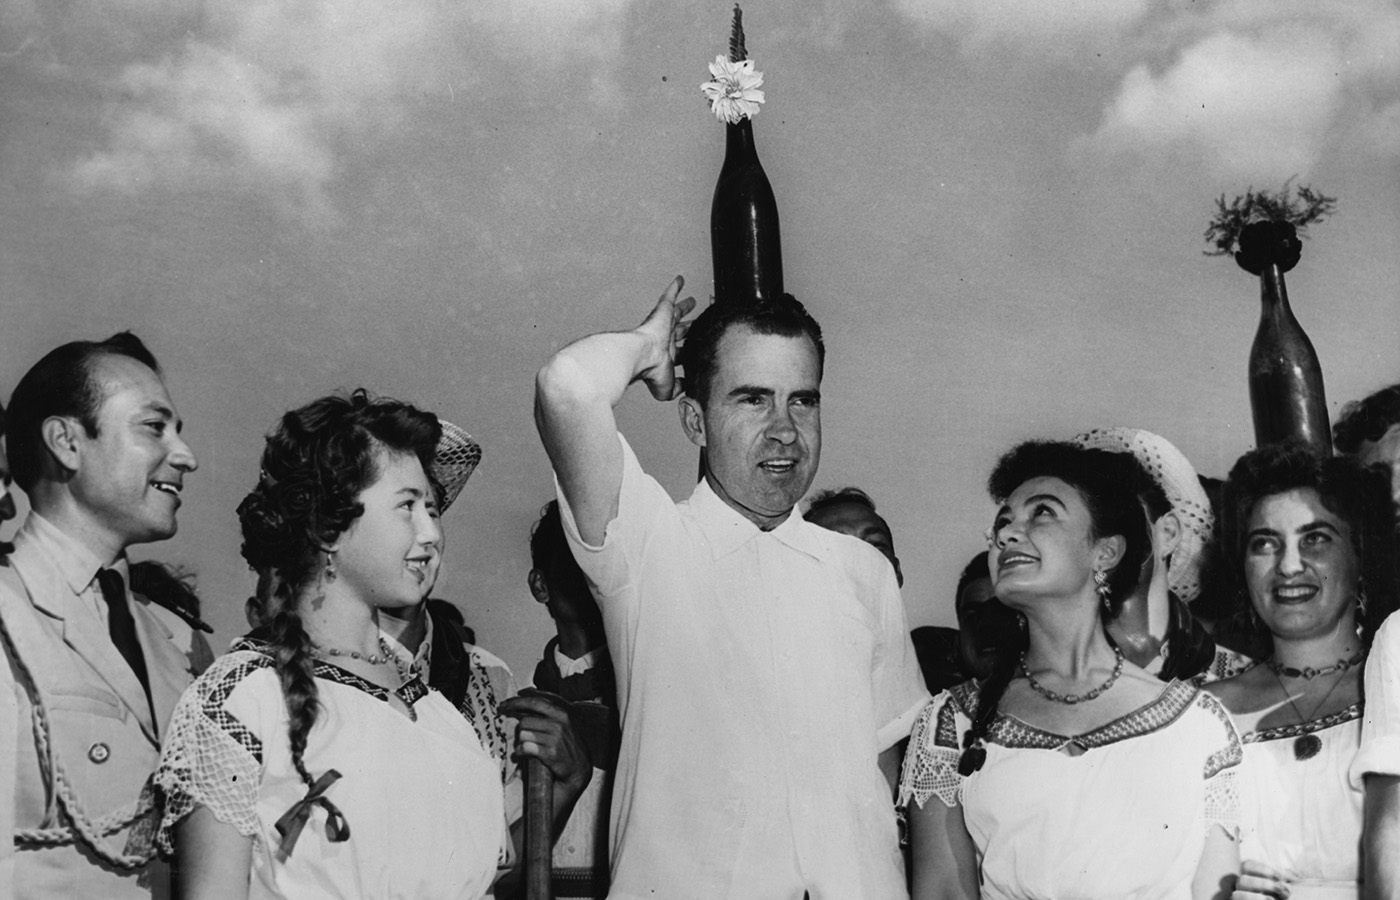 Richard Nixon balances a bottle on his head